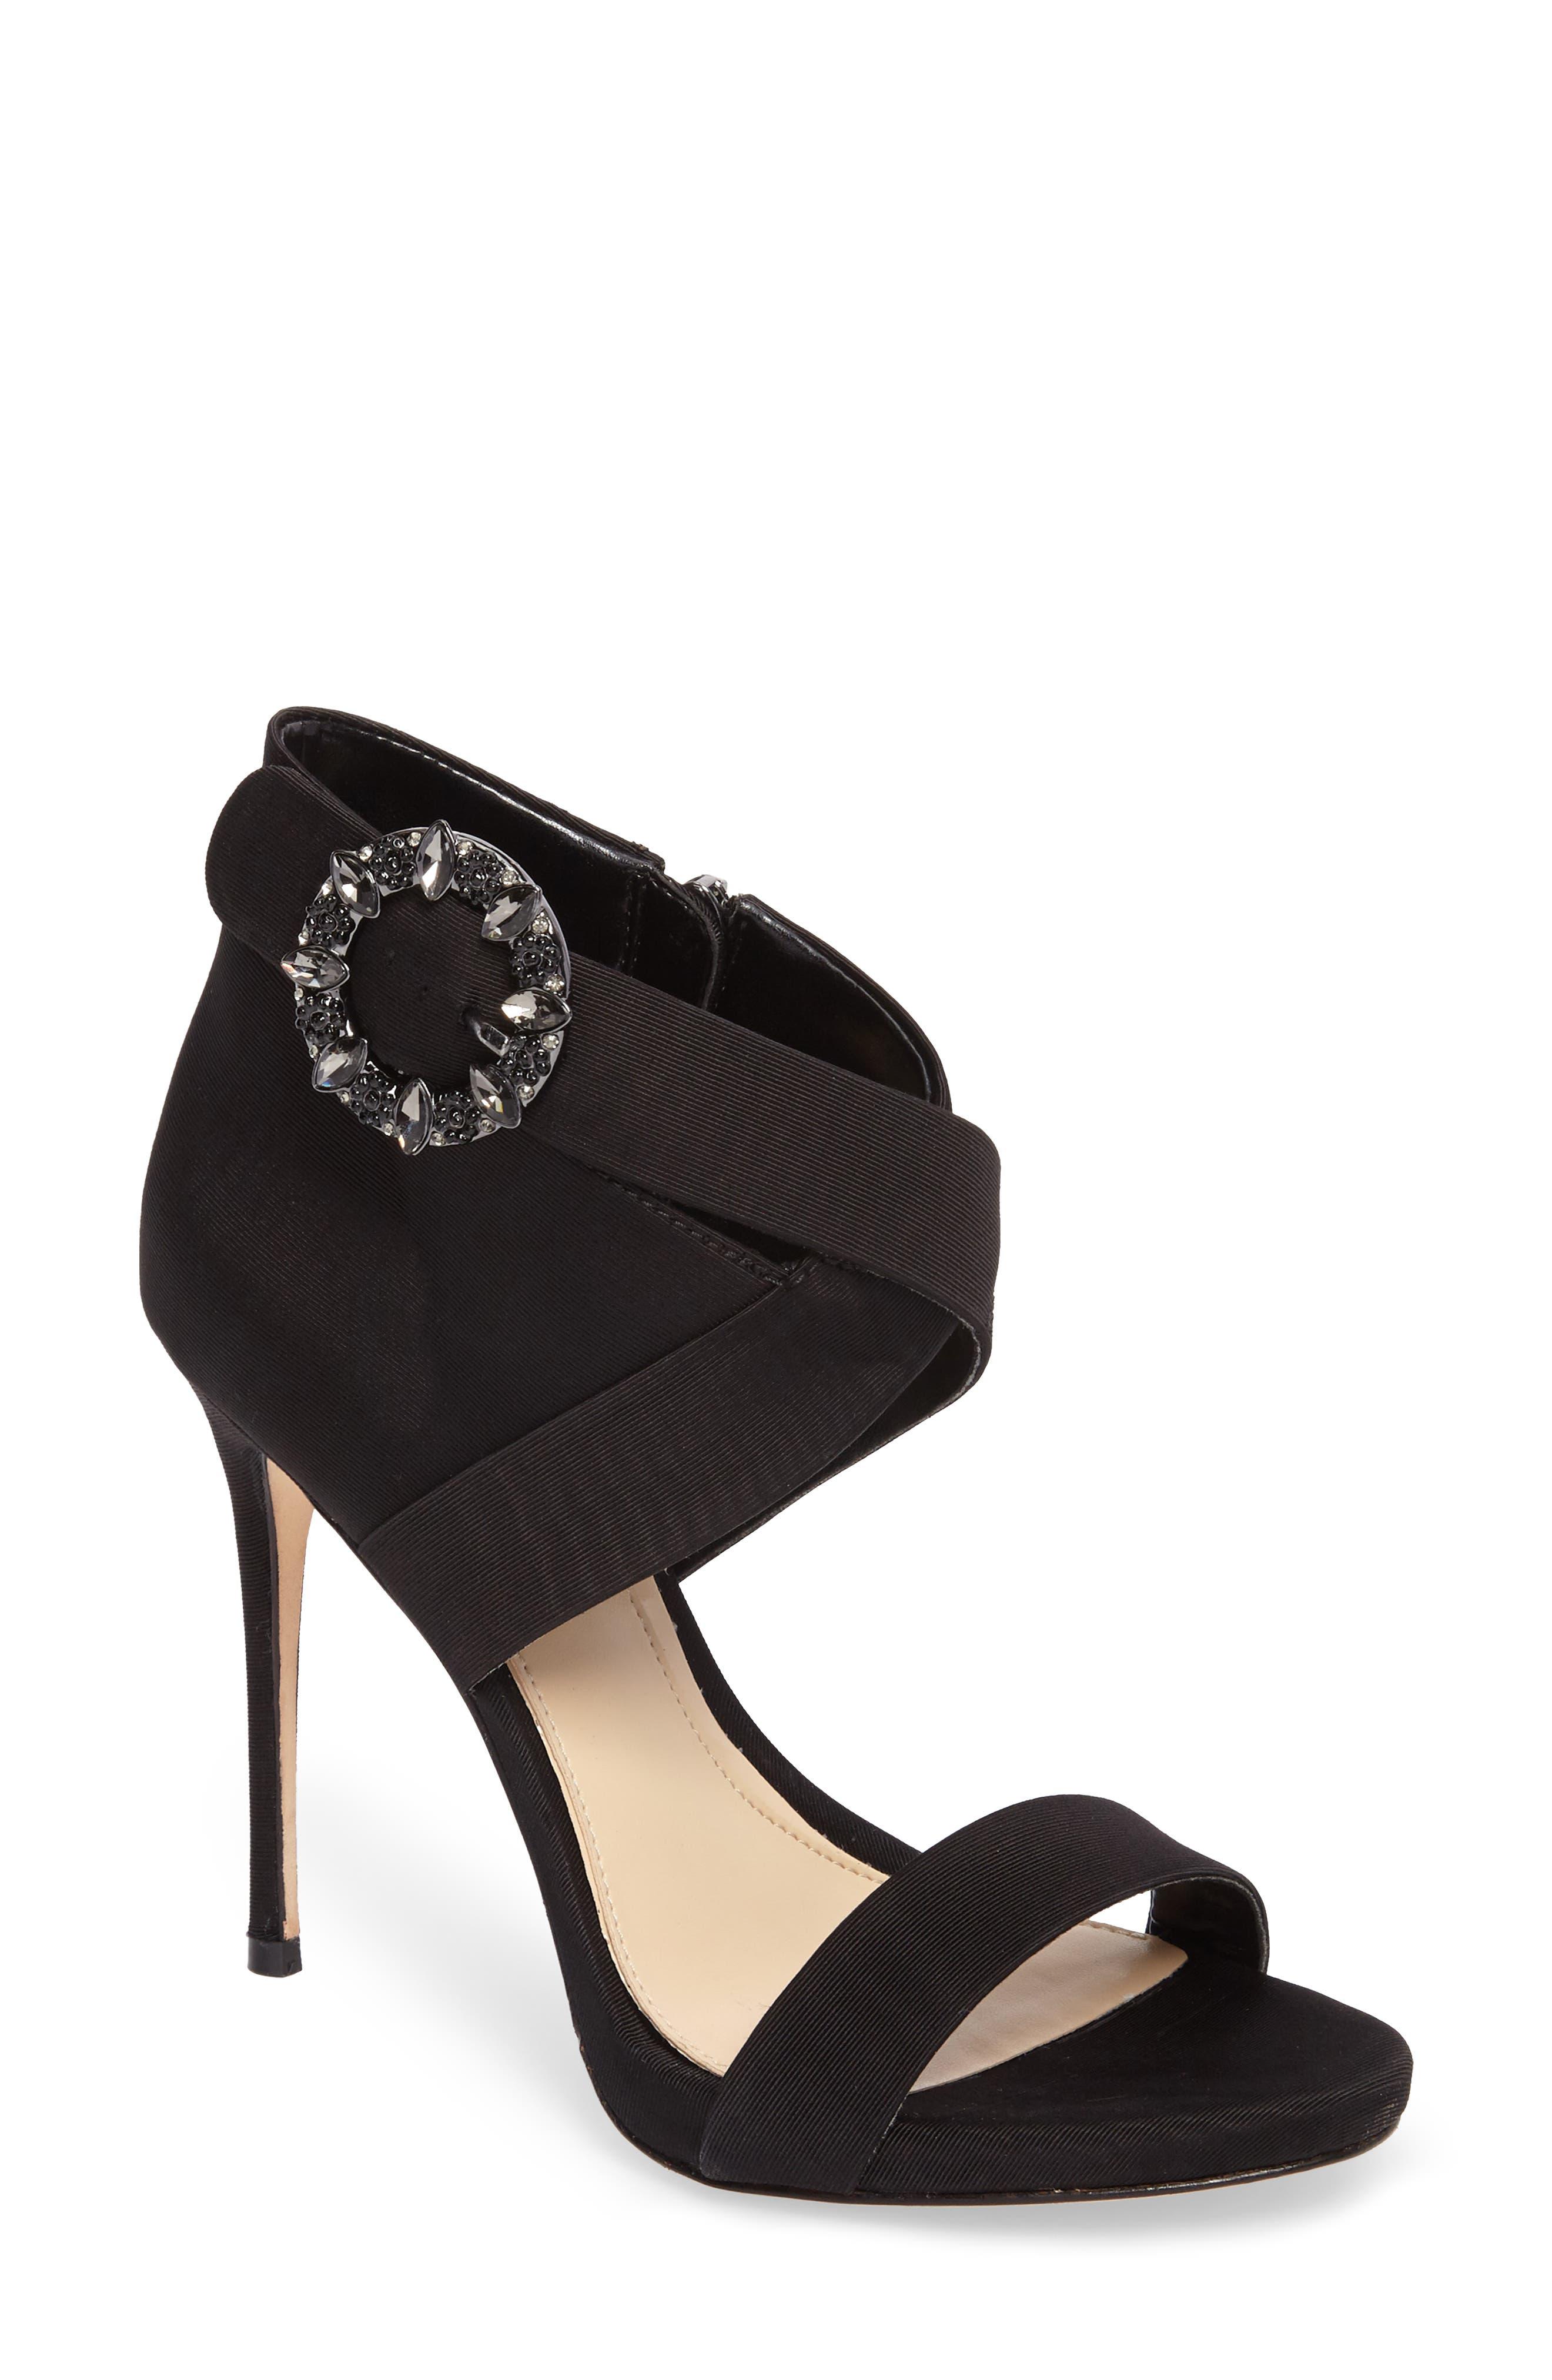 Vince Camuto Dashal Crystal Buckle Sandal,                         Main,                         color,